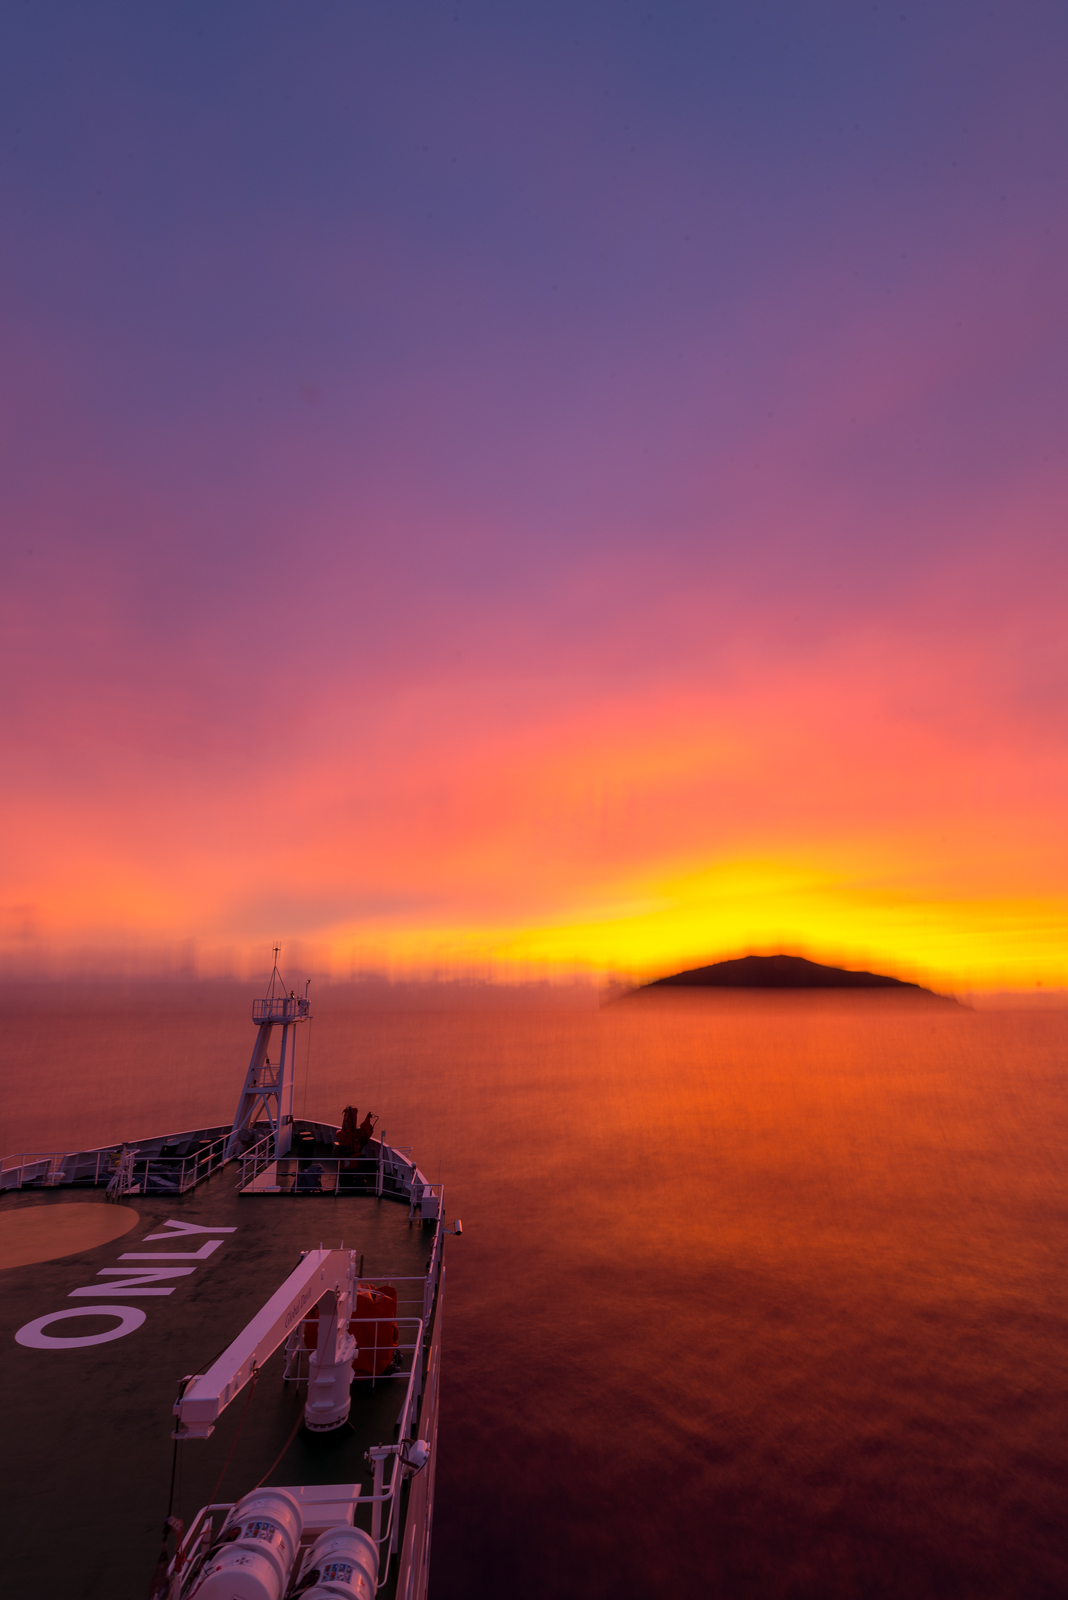 Long exposure of Macauley Island in sunrise.